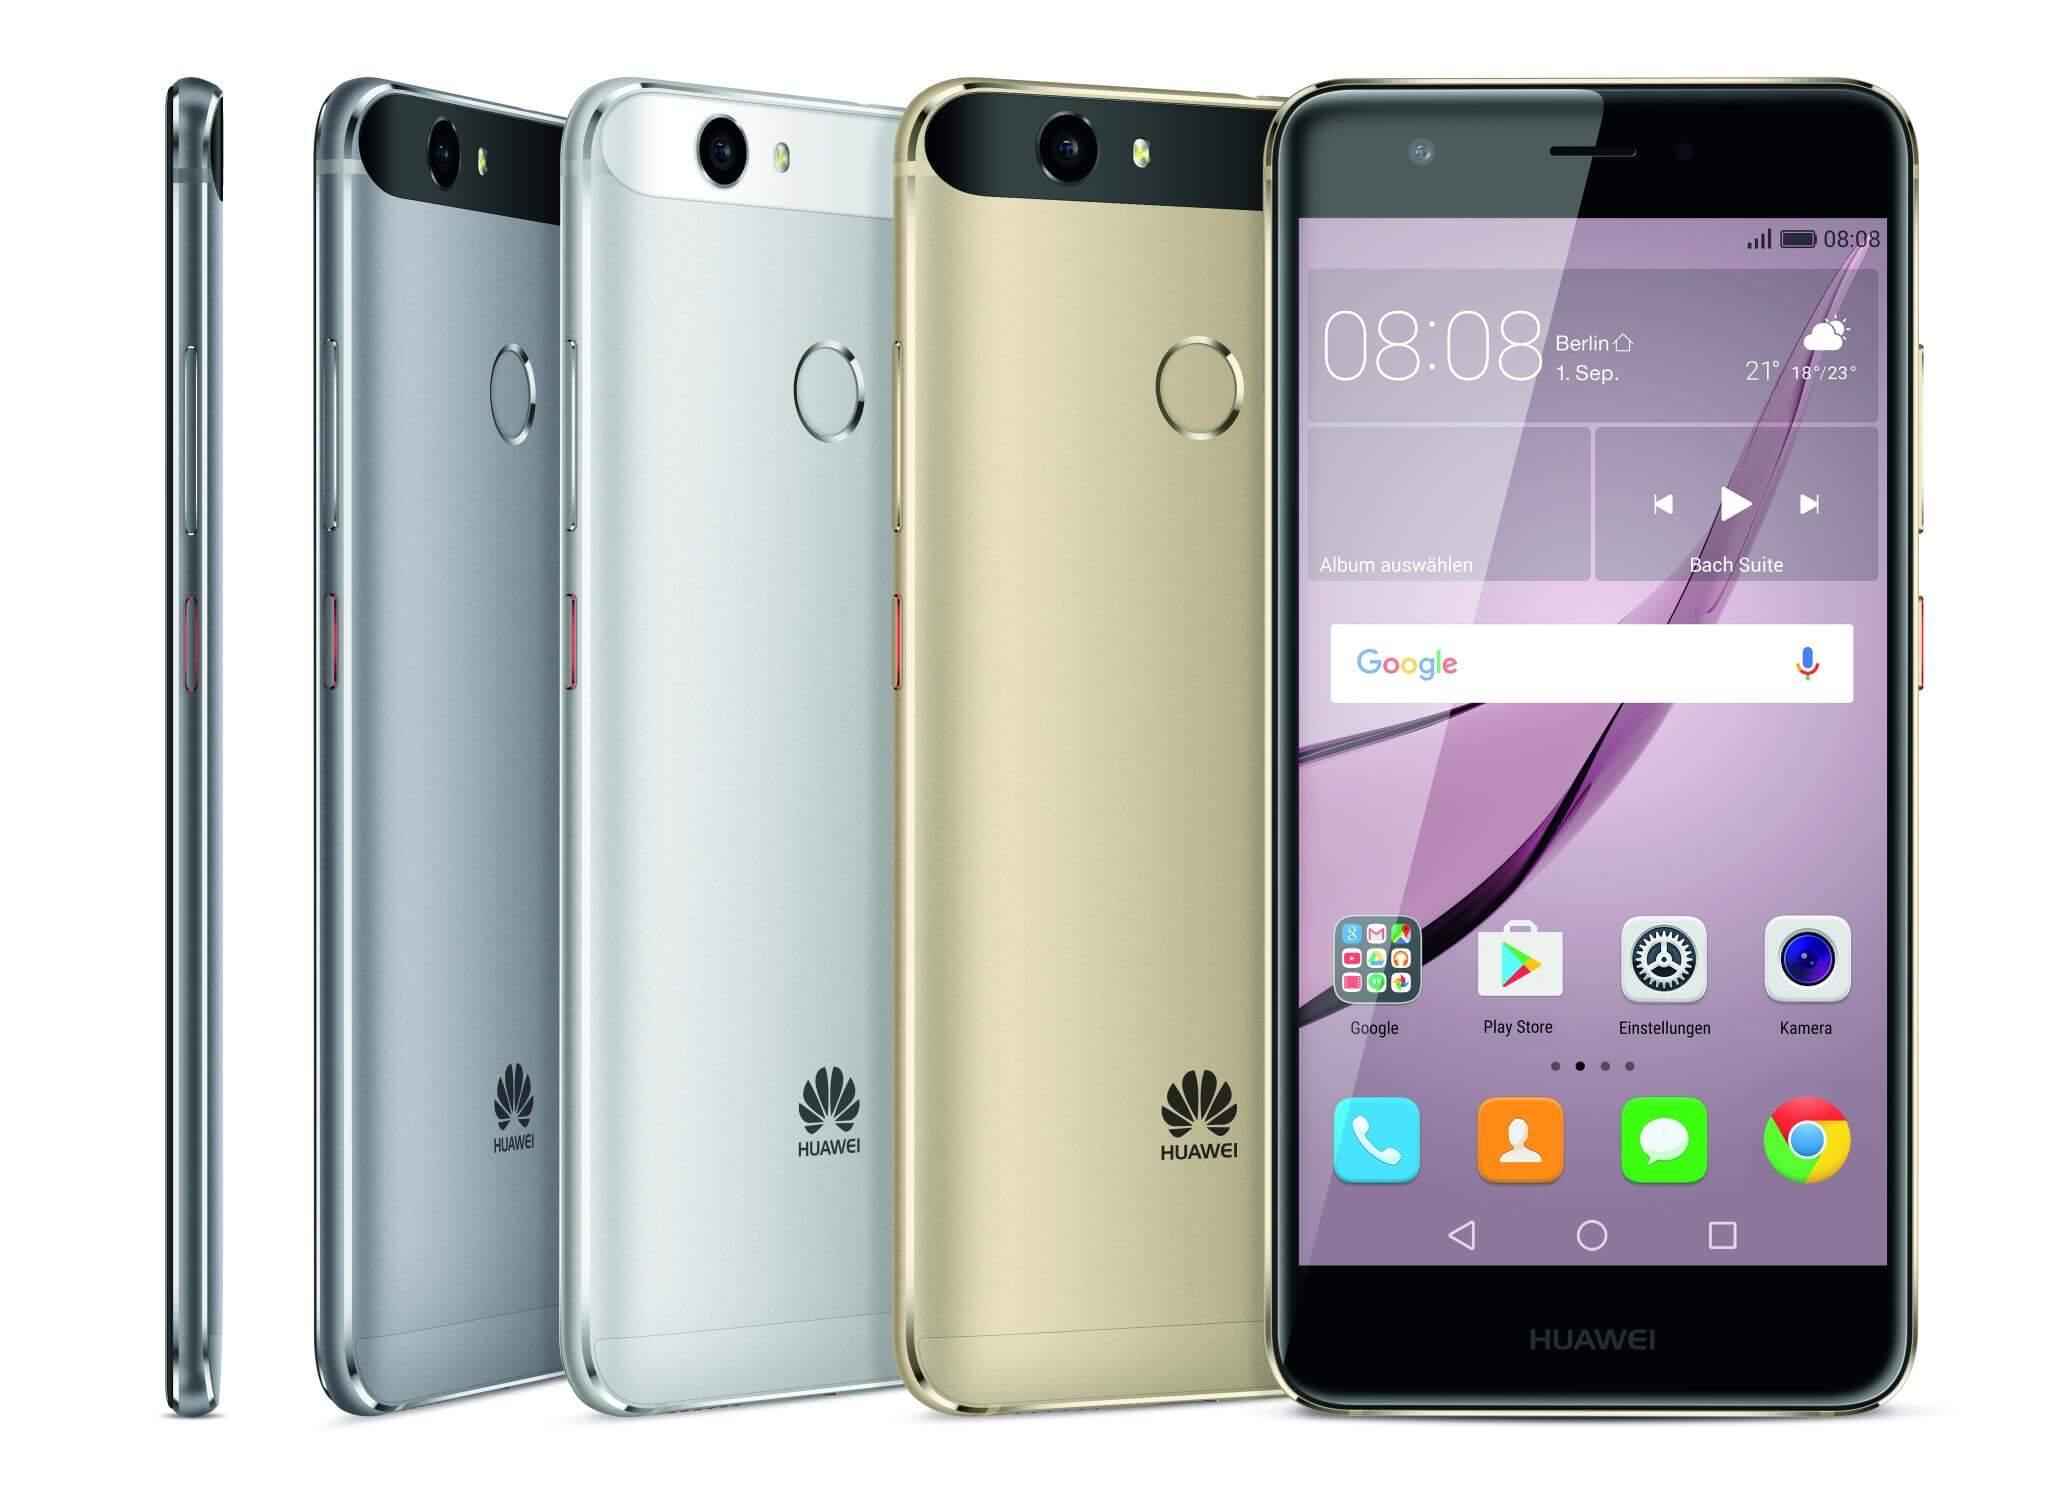 Test Huawei Nova Smartphone Notebookcheck Com Tests